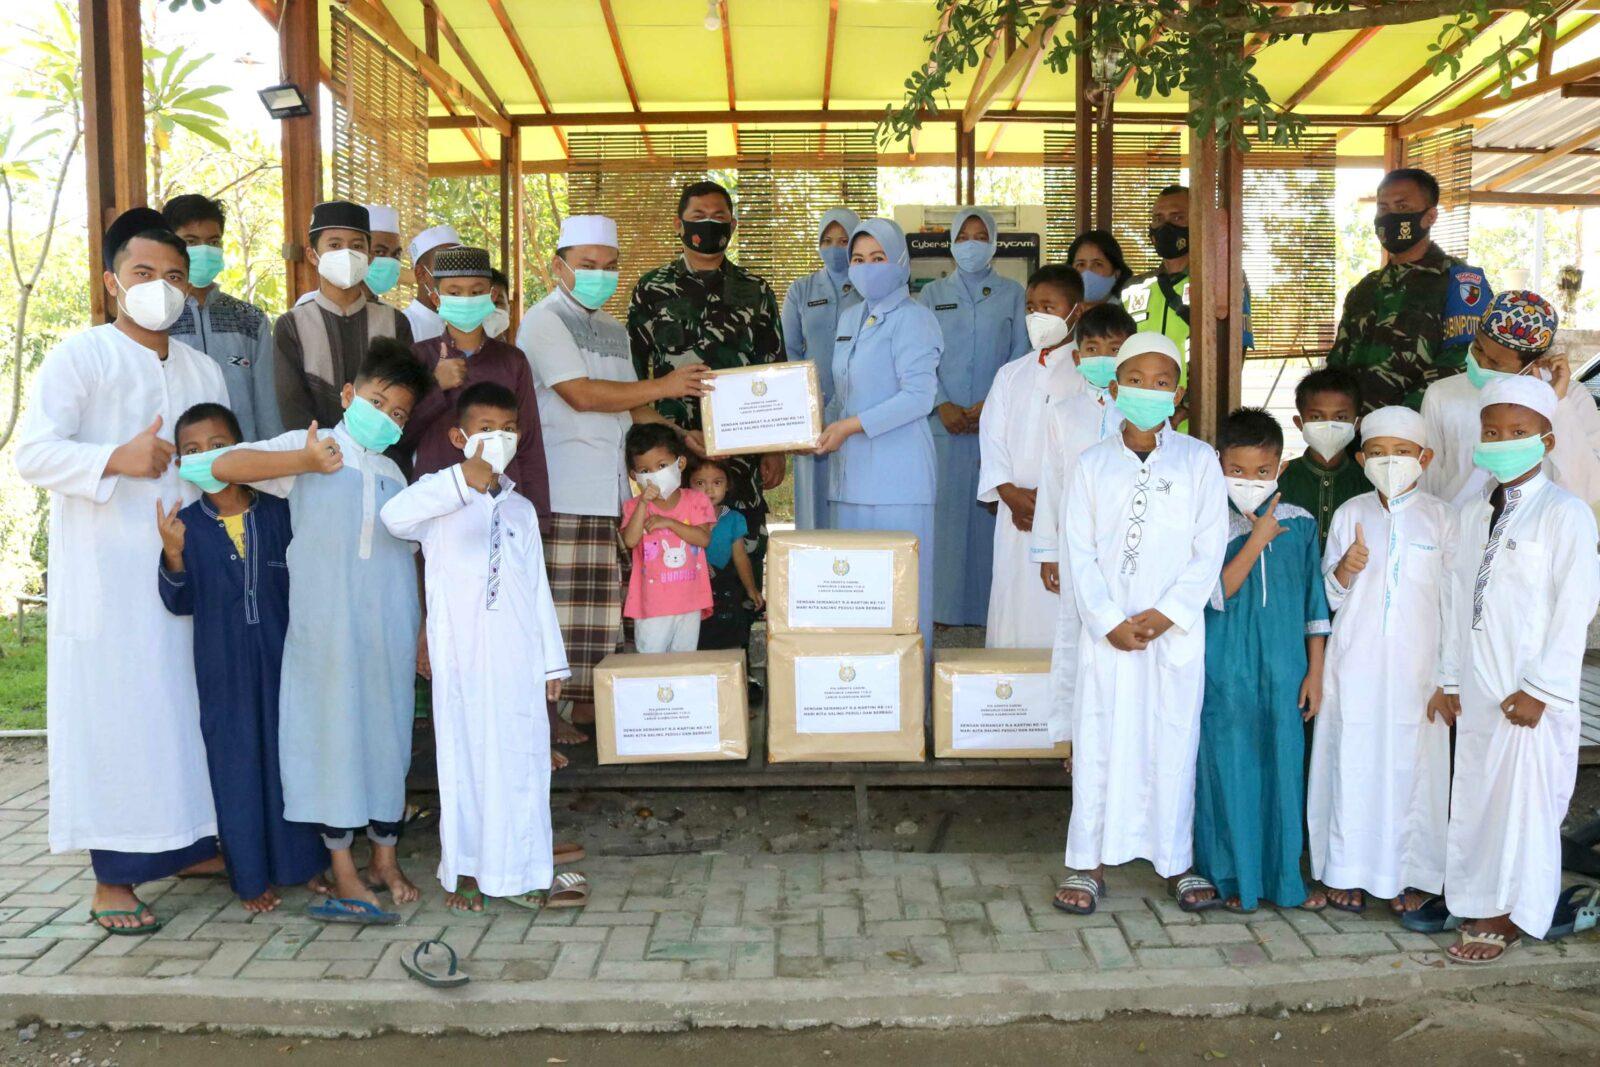 Saling Peduli dan Berbagi, PIA AG Cab.11/D.II Lanud Sjamsudin Noor Anjangsana Ke Rumah Anak Yatim Ar-Rohman Banjarbaru dan Berikan Kursi Roda Kepada Penyandang Disabilitas